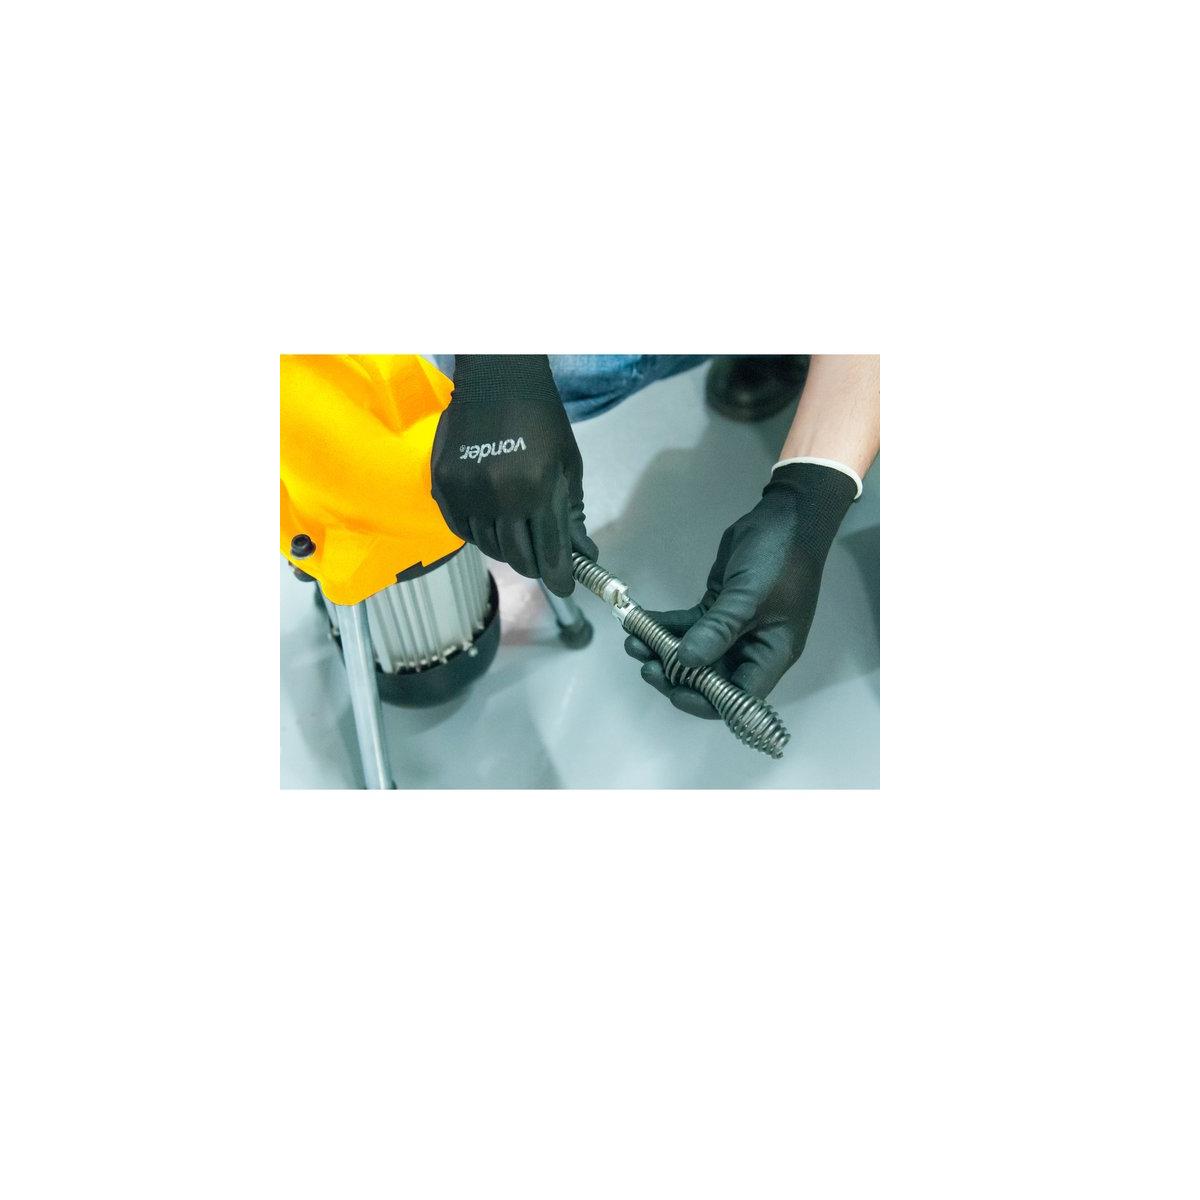 Desentupidora elétrica DV 390 127V VONDER